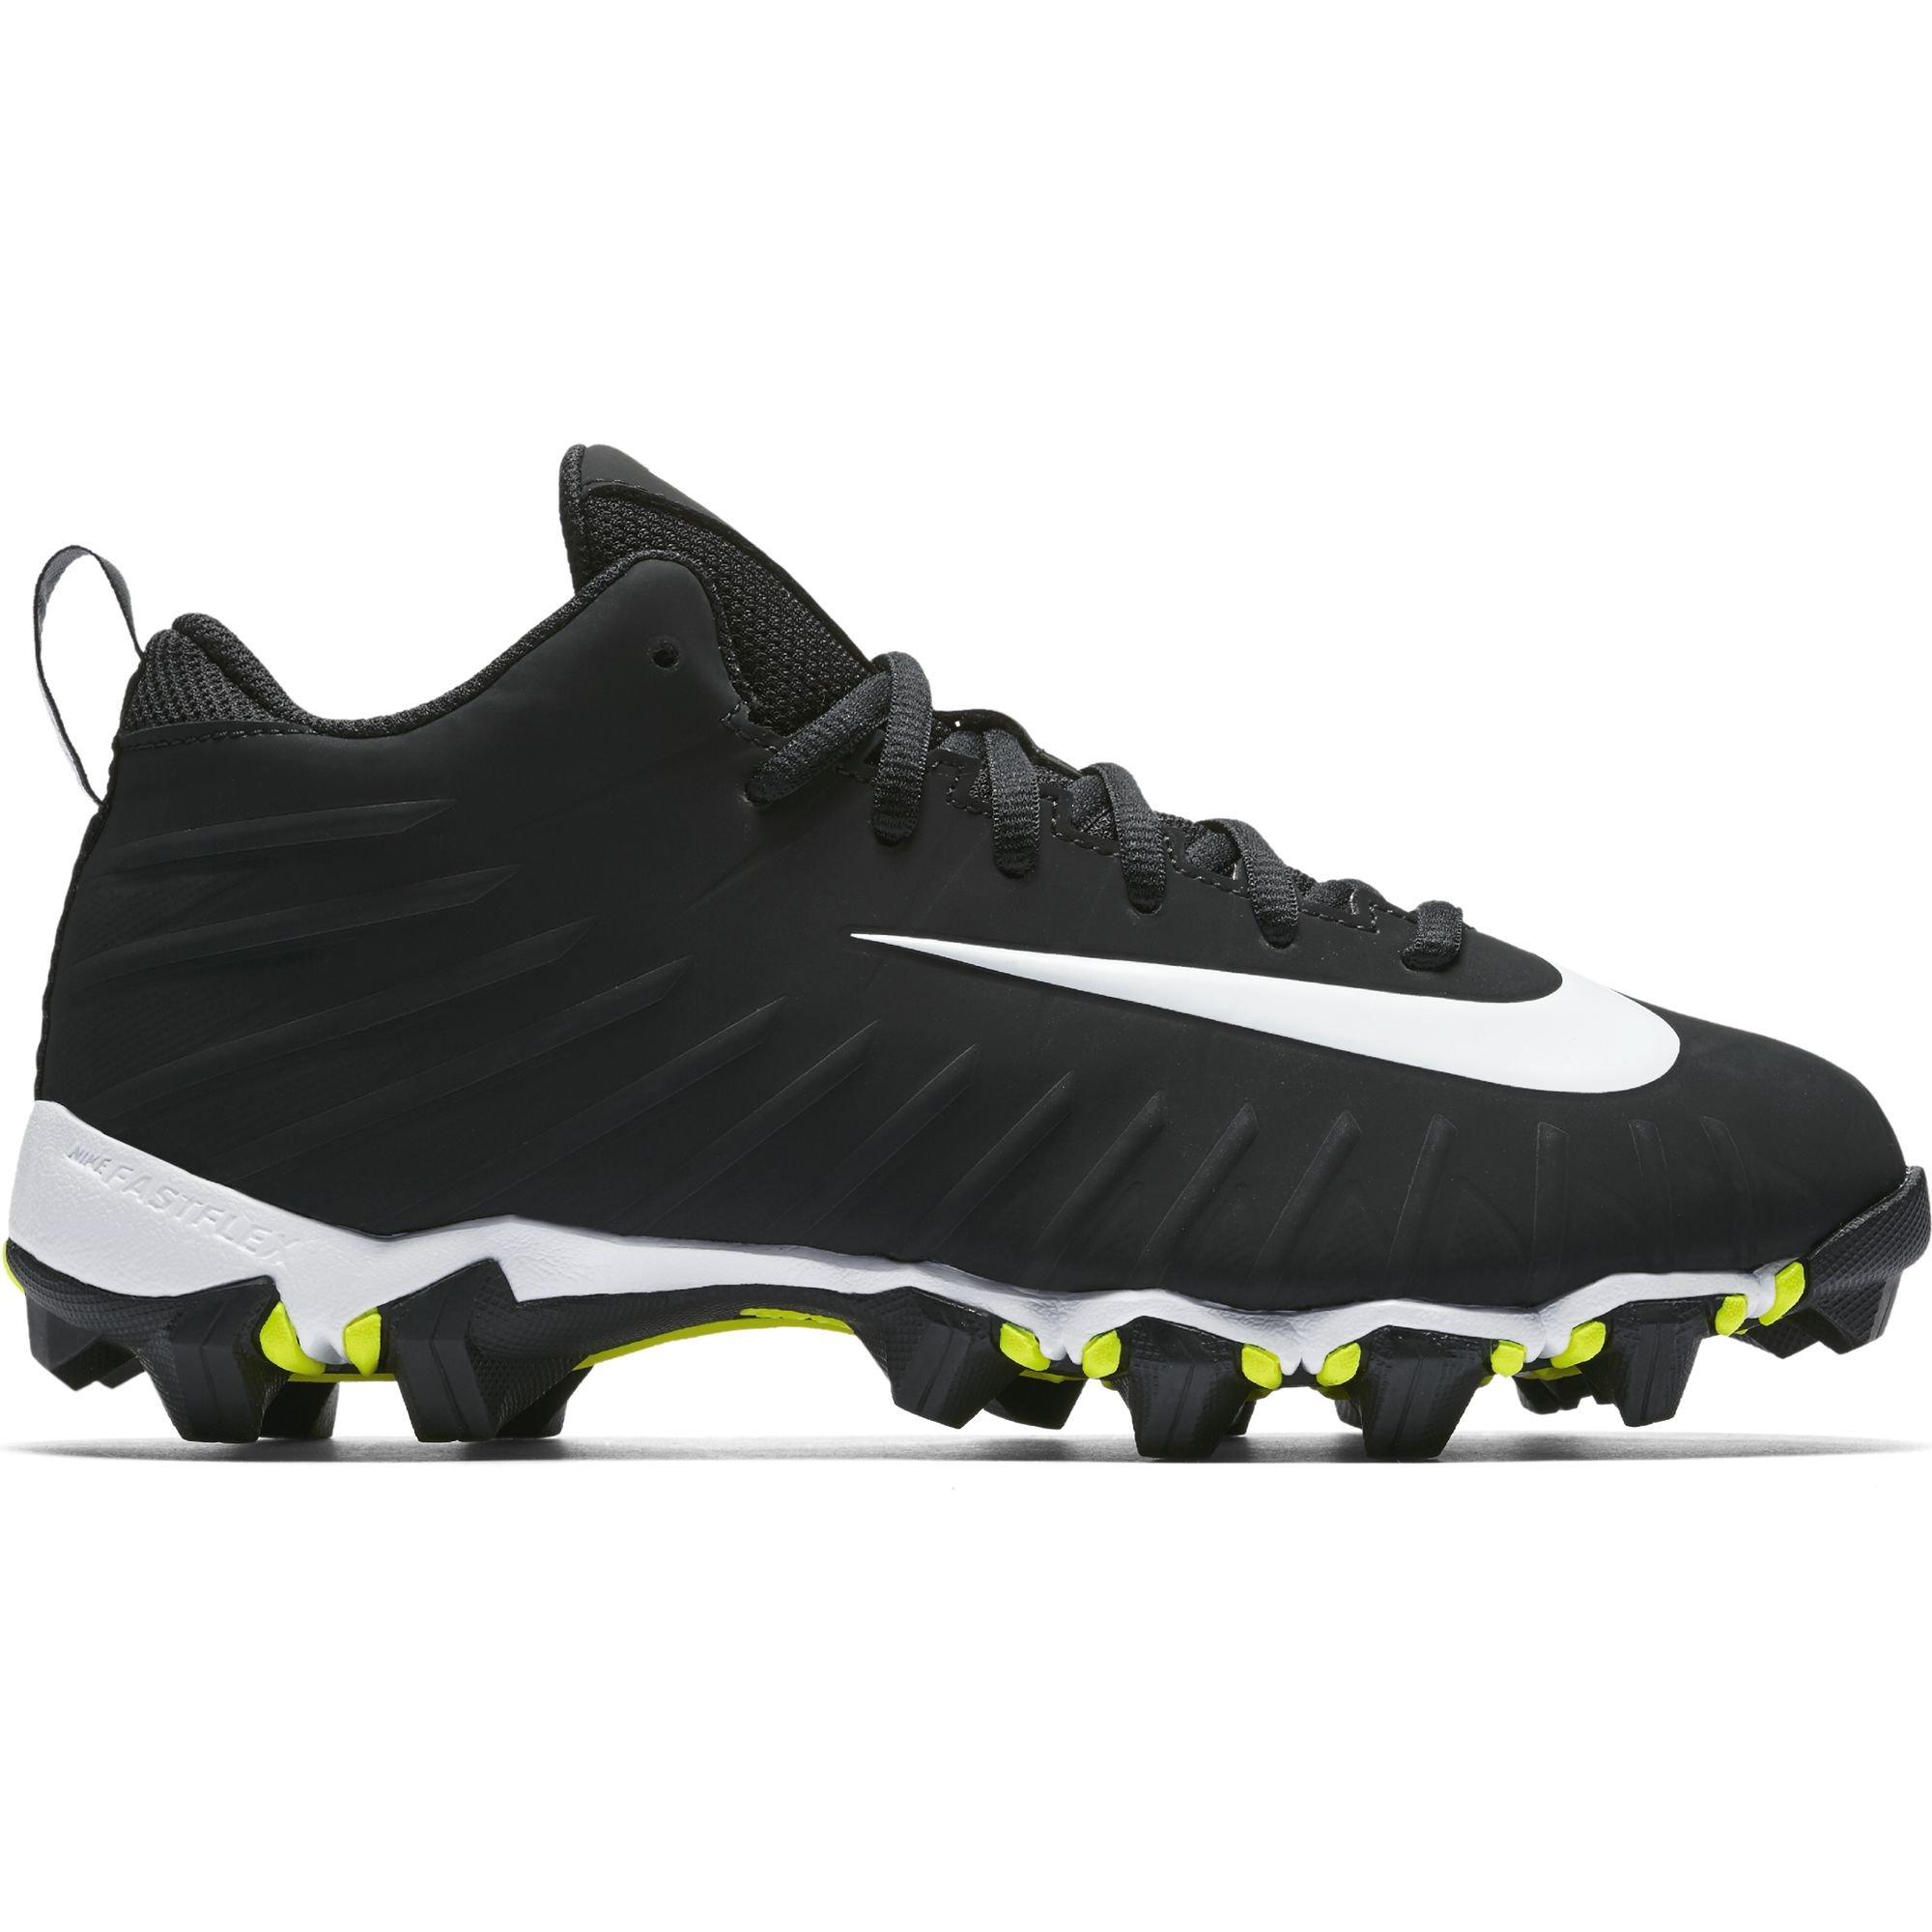 cc370f38d12c Galleon - Nike Boy's Alpha Menace Shark BG Football Cleat Wide Black/White  Size 4 M US